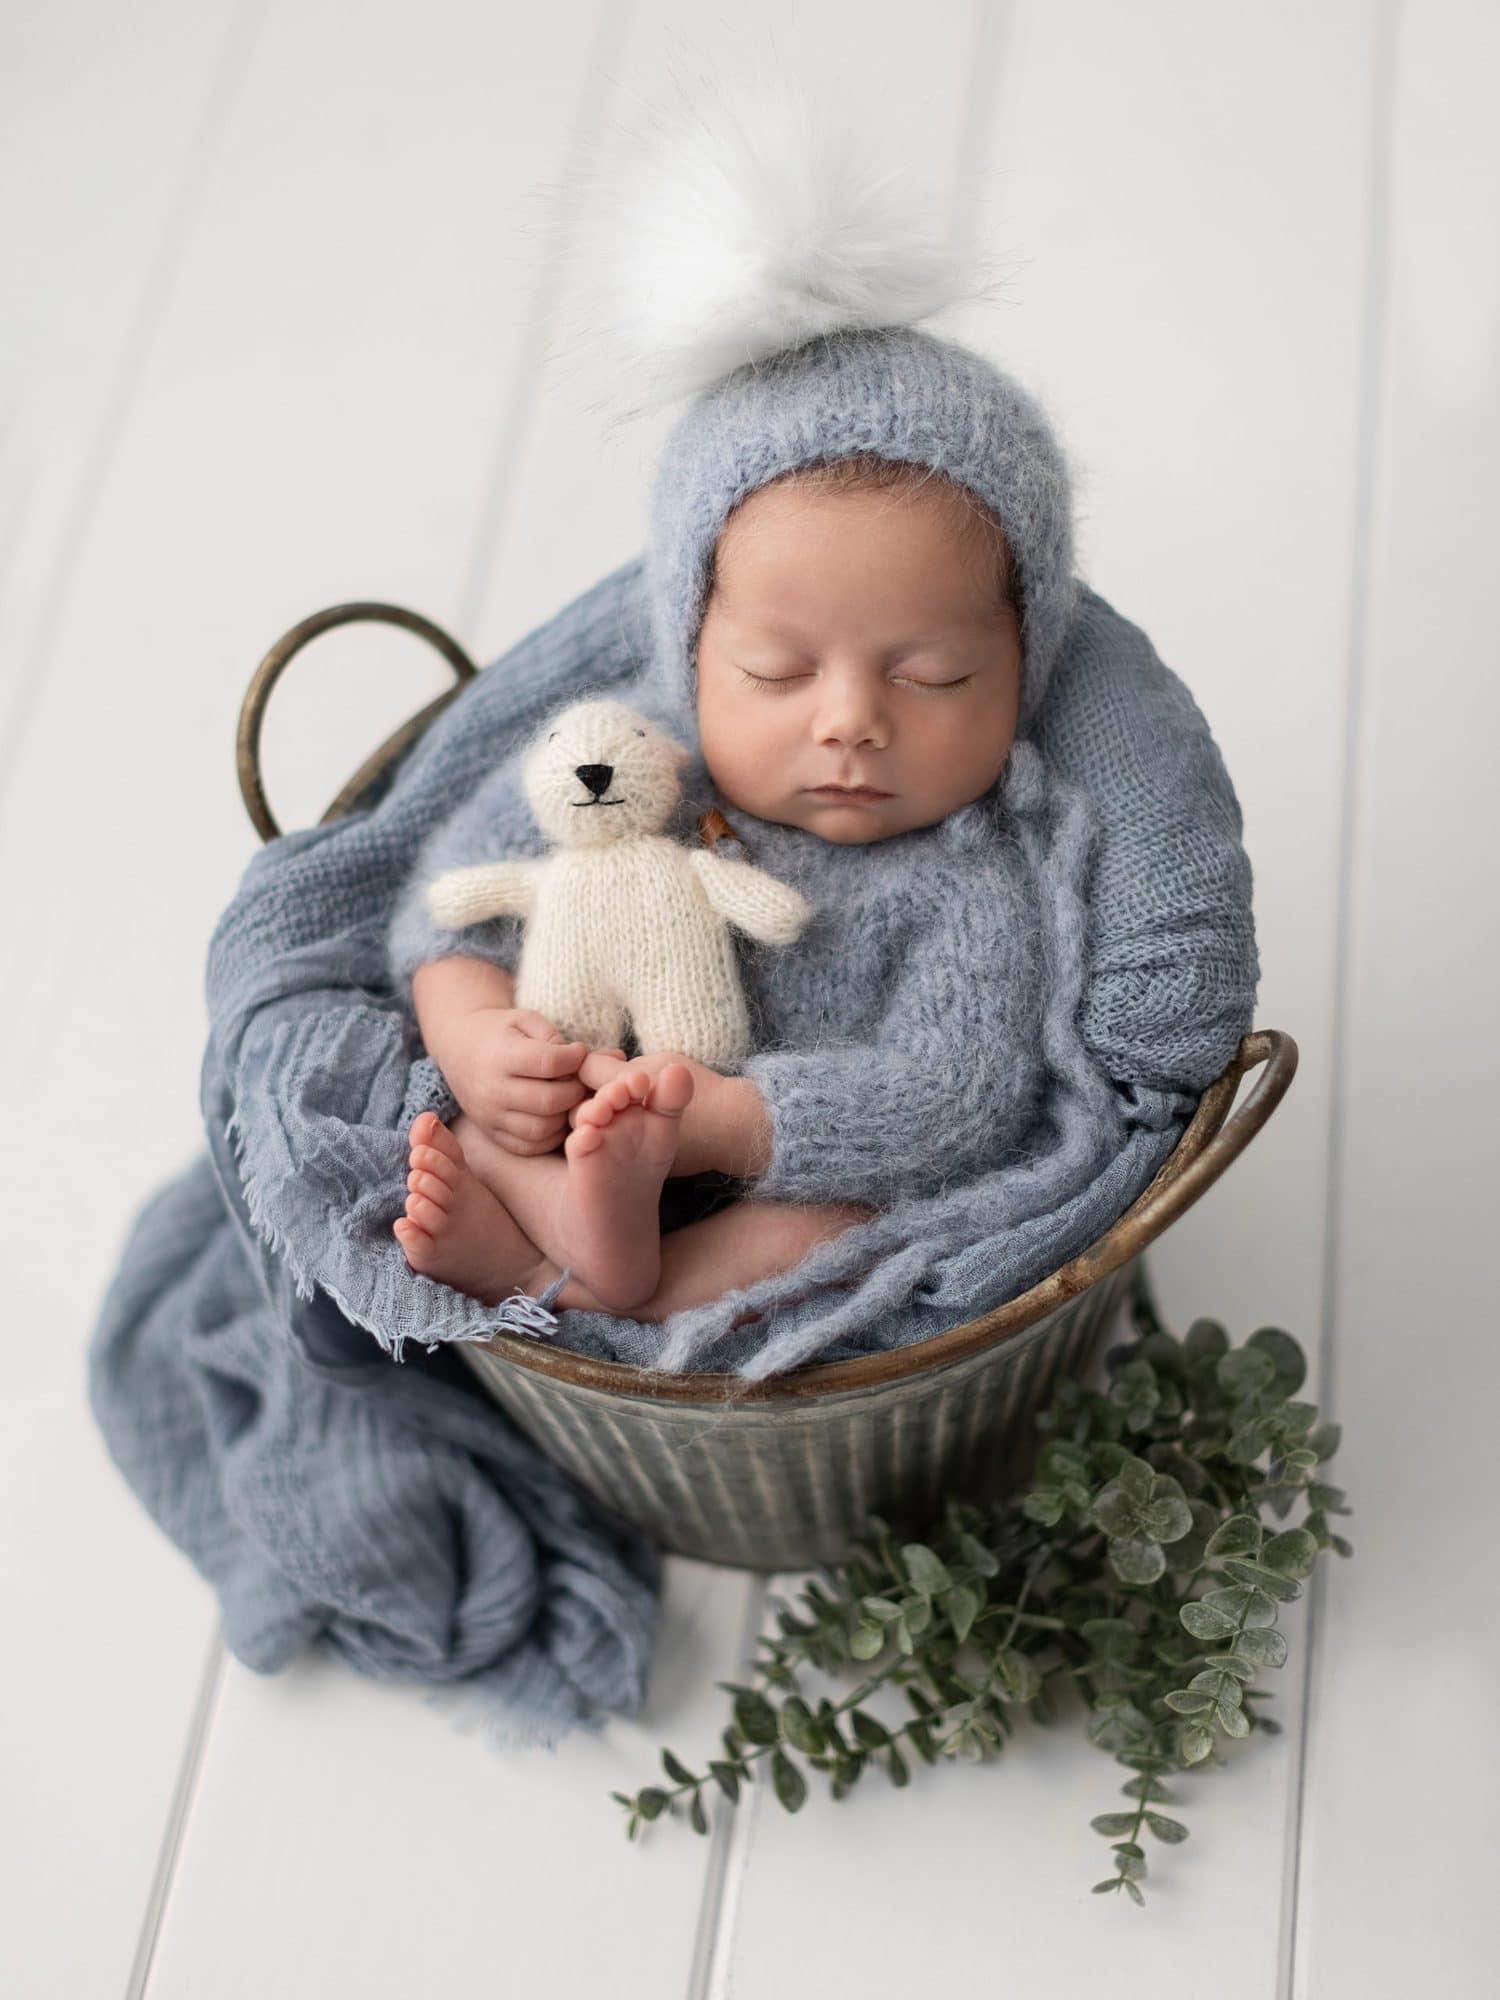 Baby boy in tin bucket during his Newborn Photoshoot in Suffolk Studio